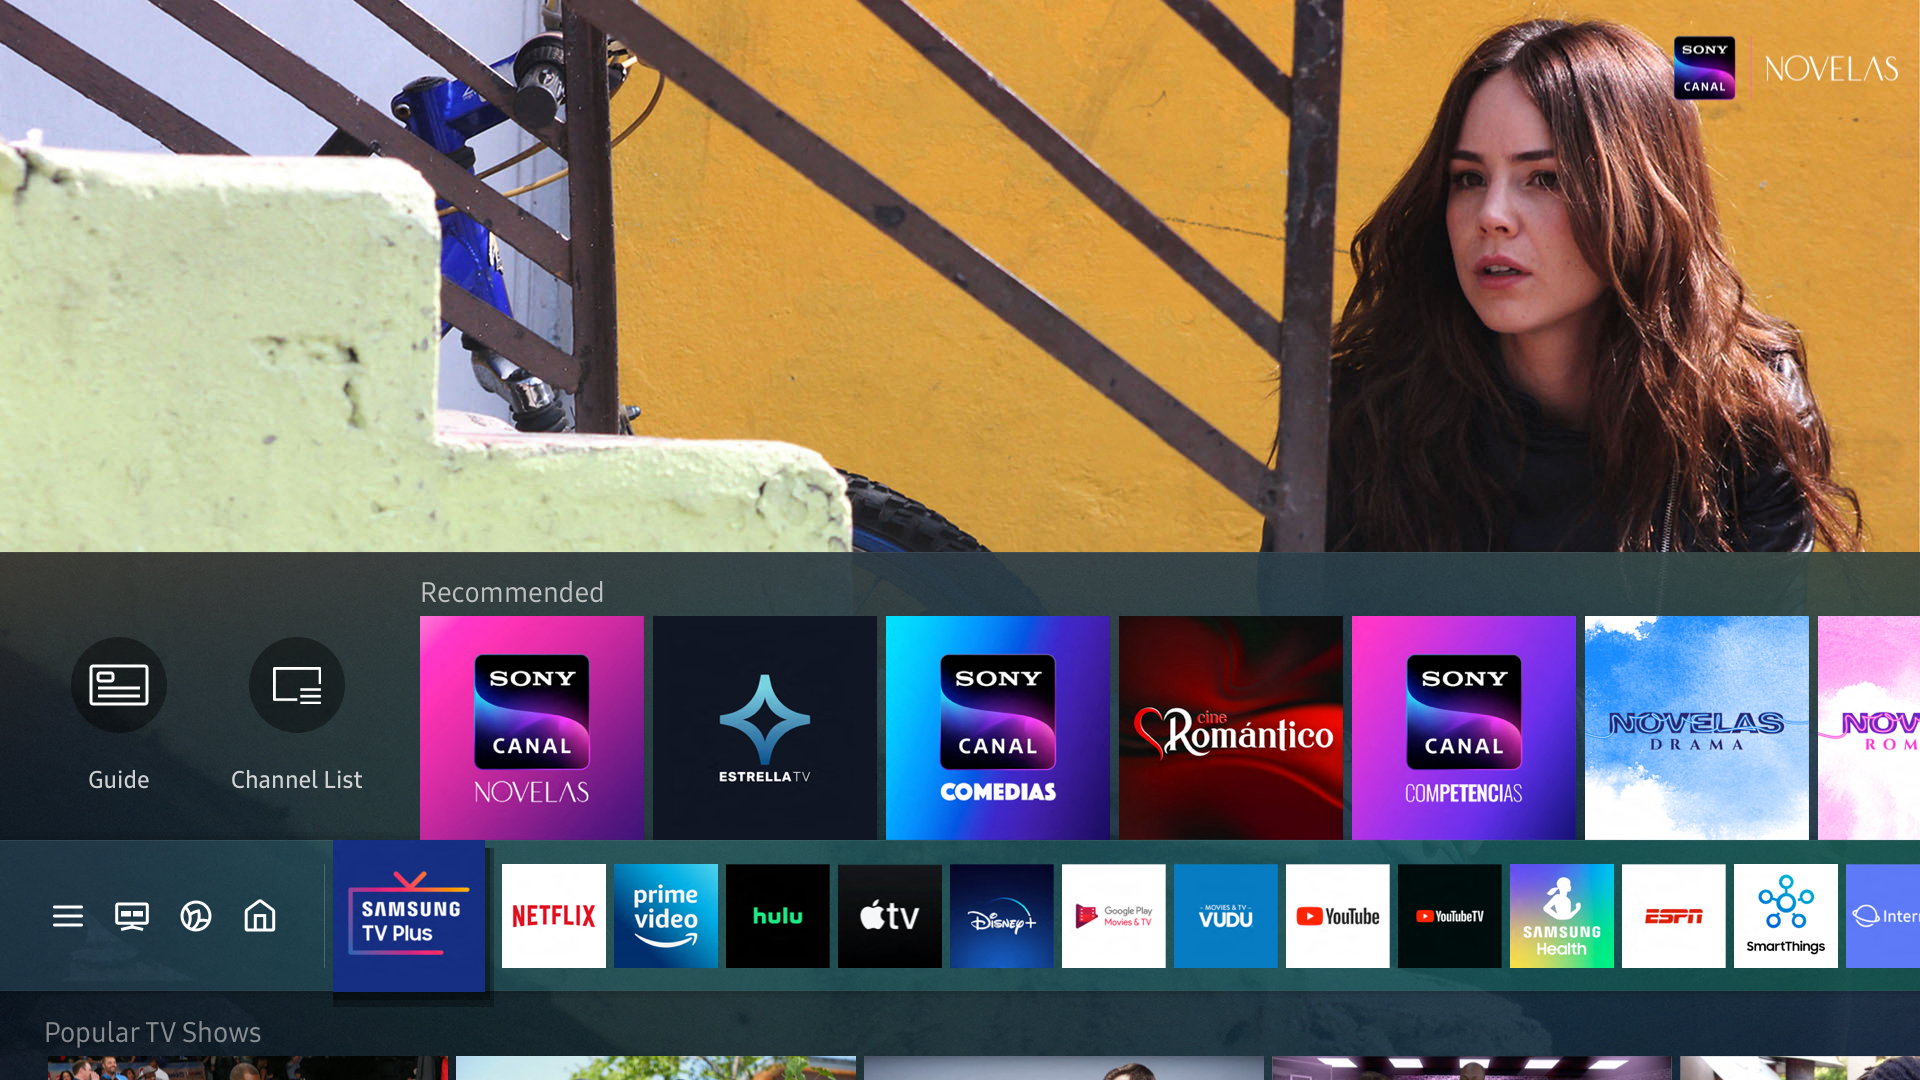 Samsung TV Plus Announces Ten Spanish-Language Channels to Celebrate Hispanic Heritage